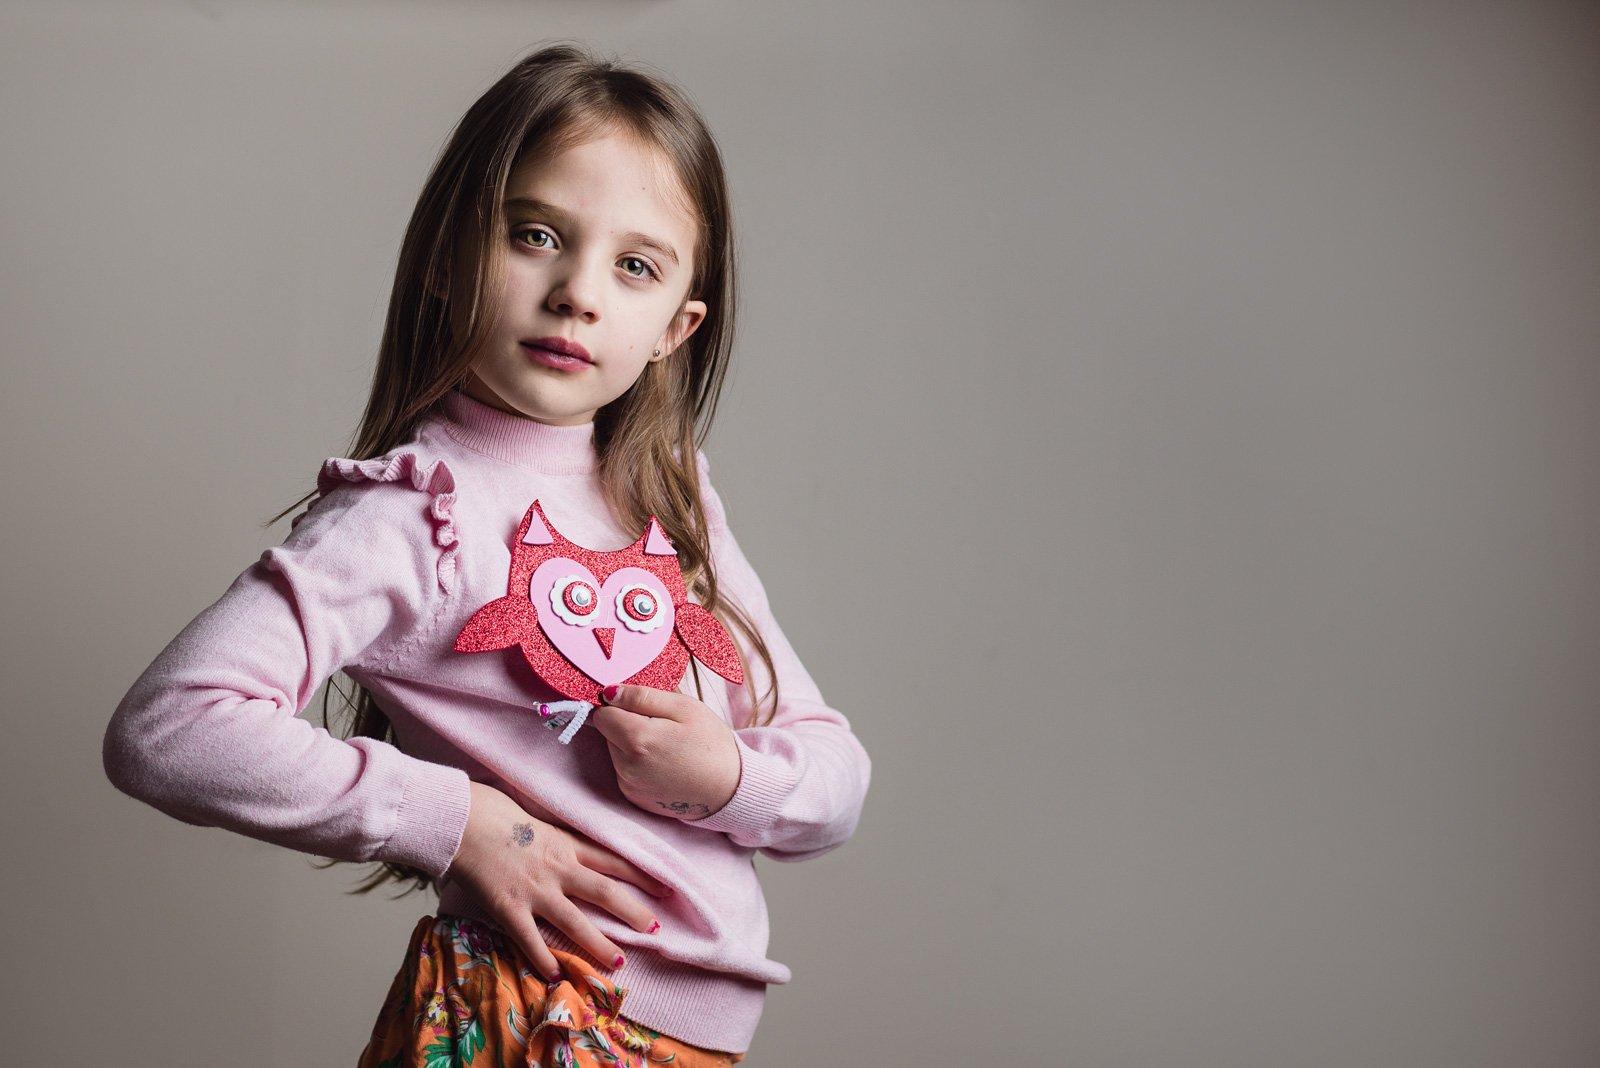 Christina-girl-holding-heart-owl_scarletgracephotography